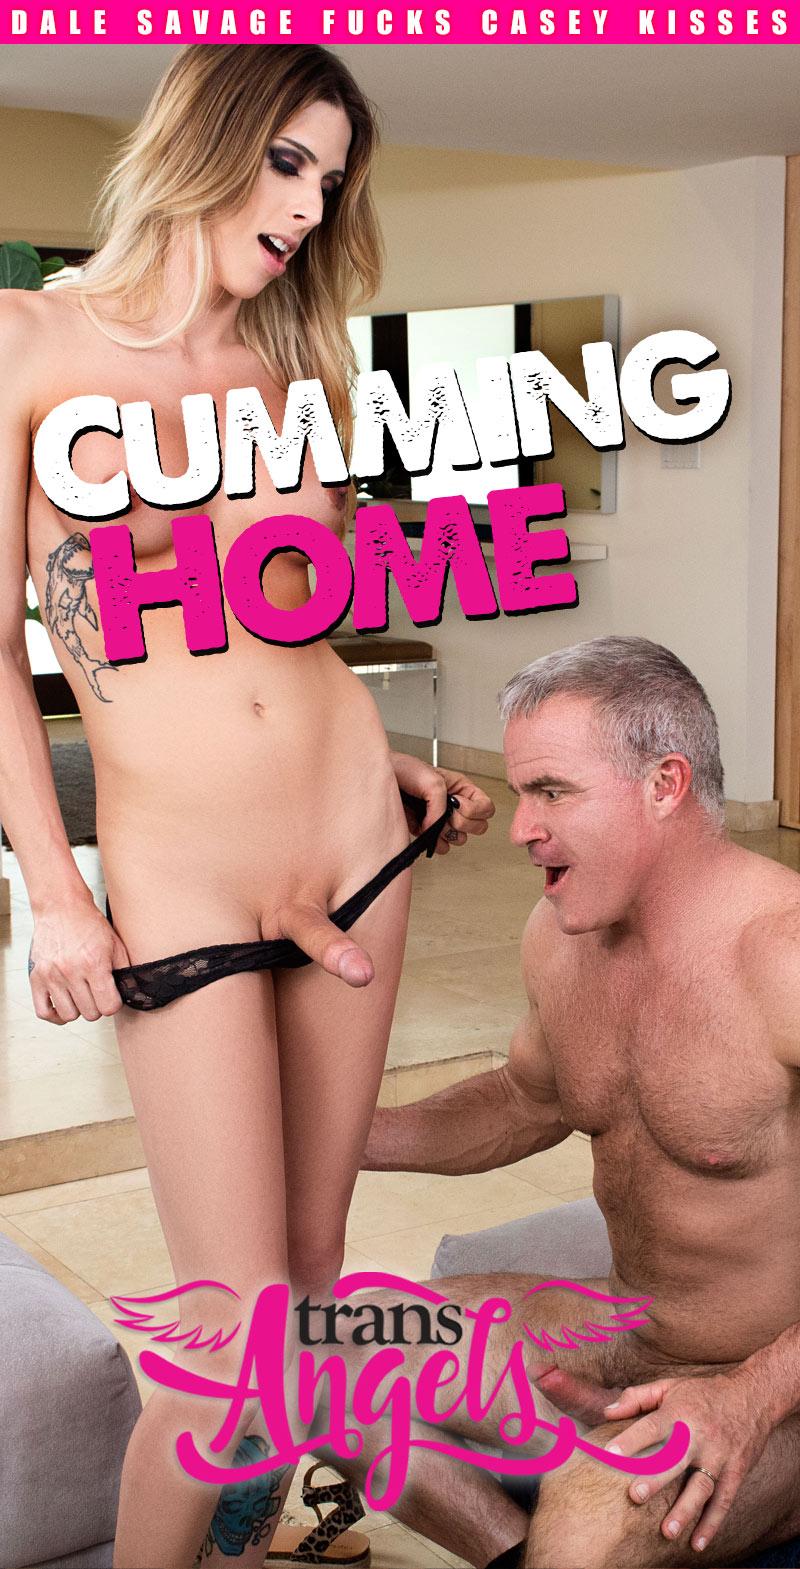 Cumming Home (Dale Savage Fucks Casey Kisses) (Bareback) at Trans Angels